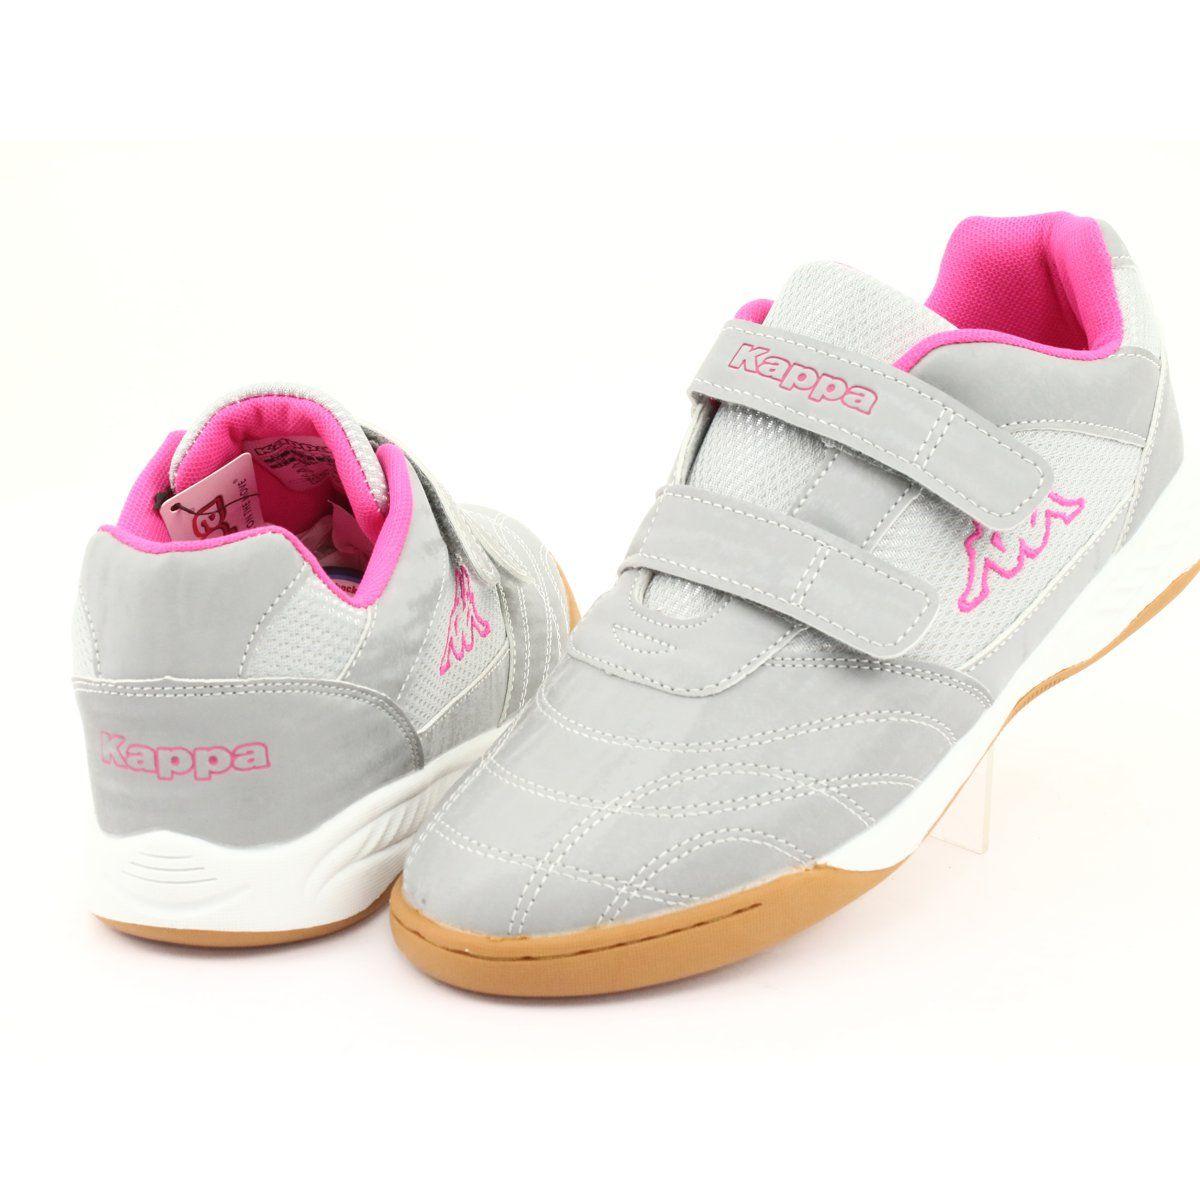 Buty Kappa Modus Ii W 242749 2121 Rozowe Shoes Sports Shoes Sports Women